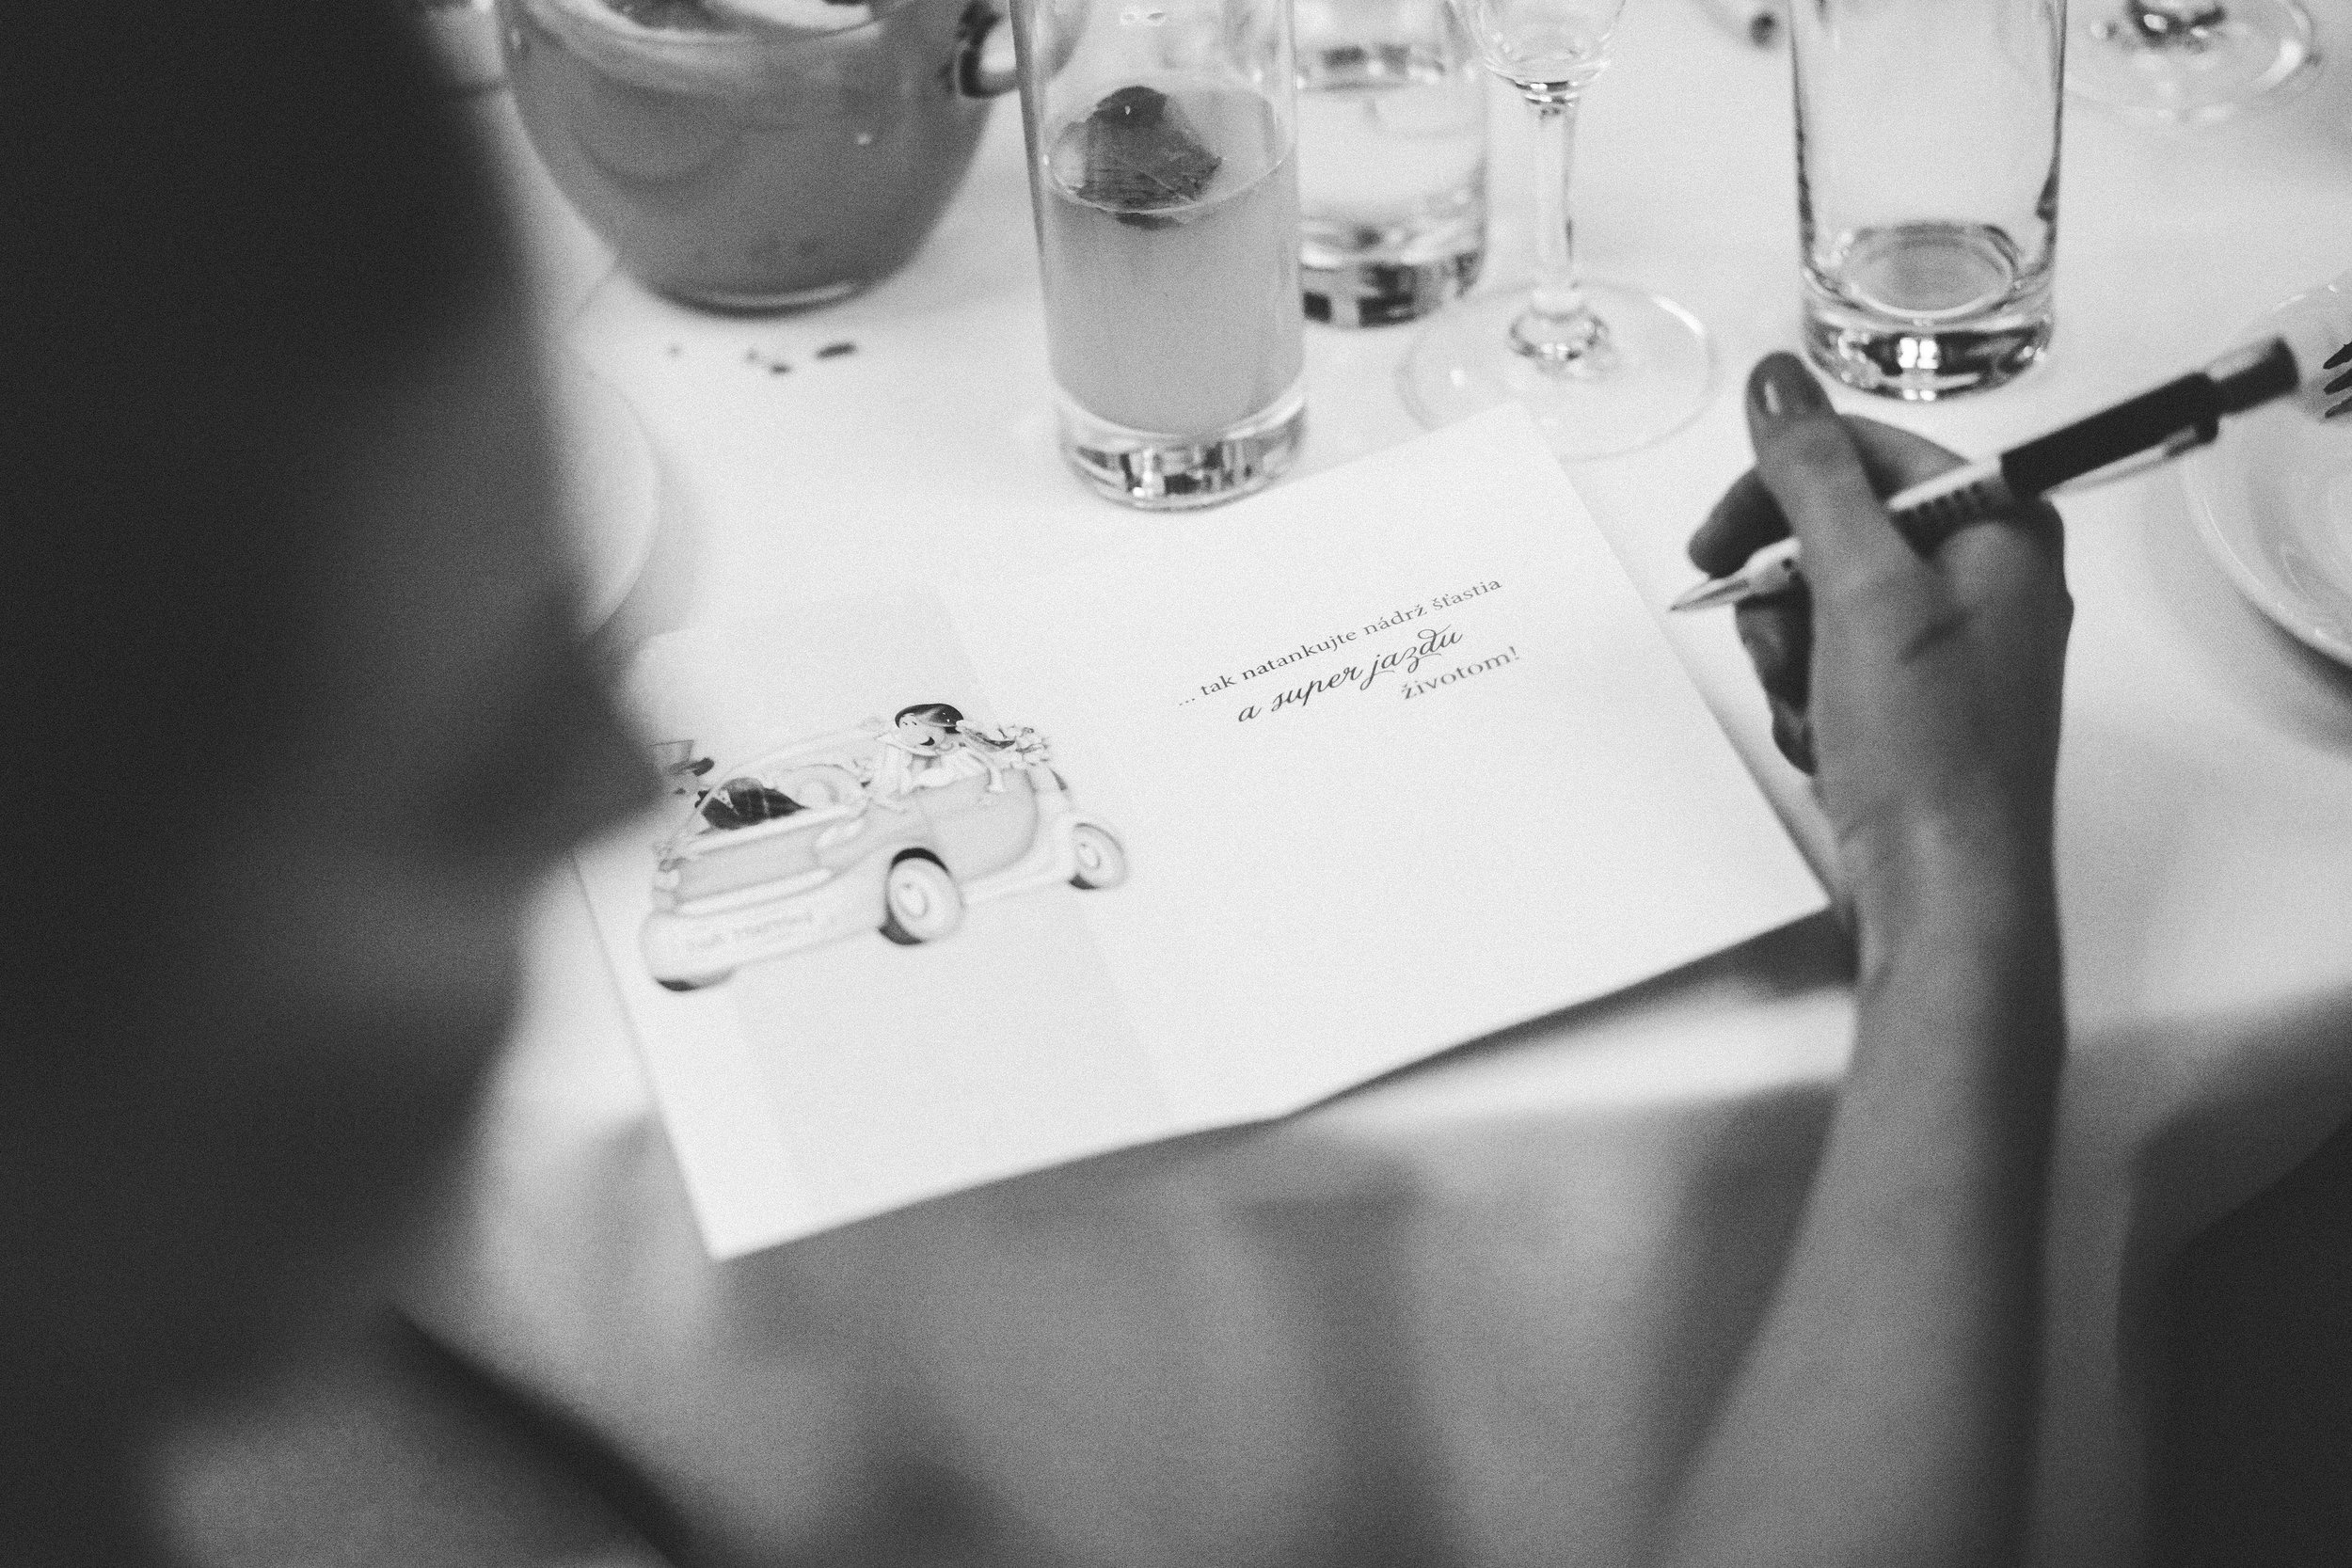 destination-wedding-photographer-slovakia-bratislava-bw-wish-letter-documentary-style-1.jpg